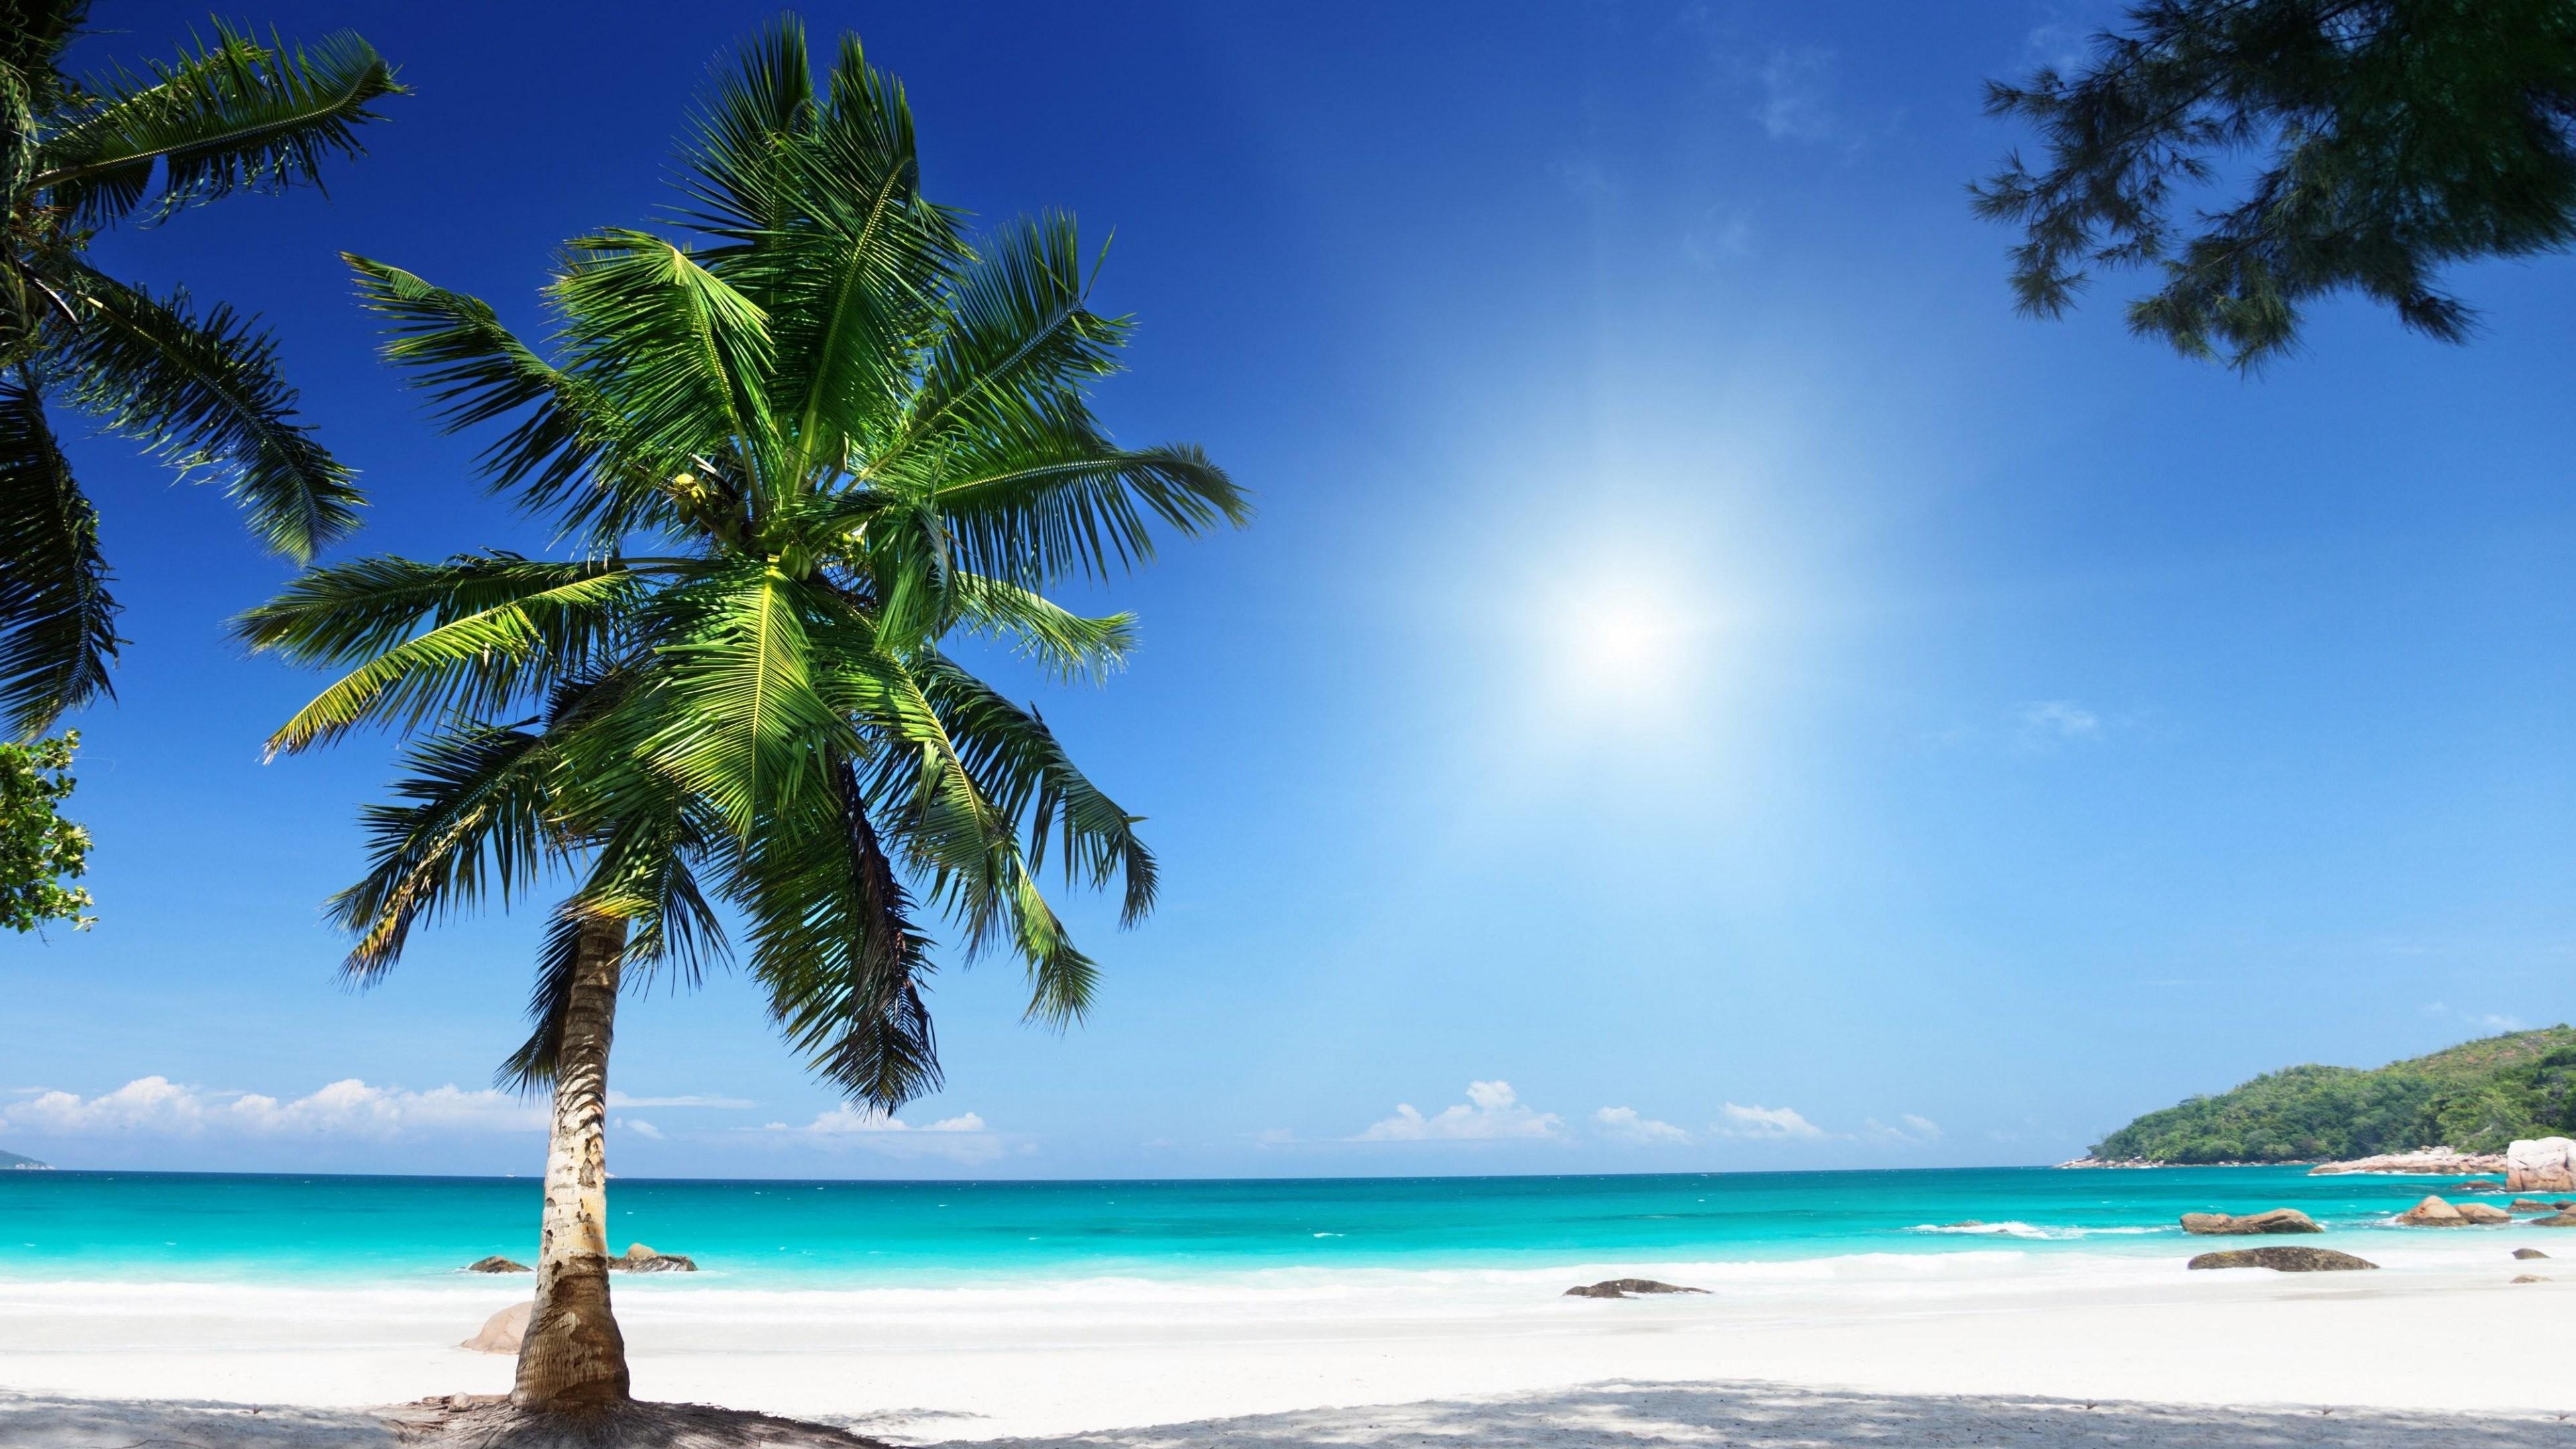 … Best Beach Wallpaper 4K tianyihengfengFree Download .